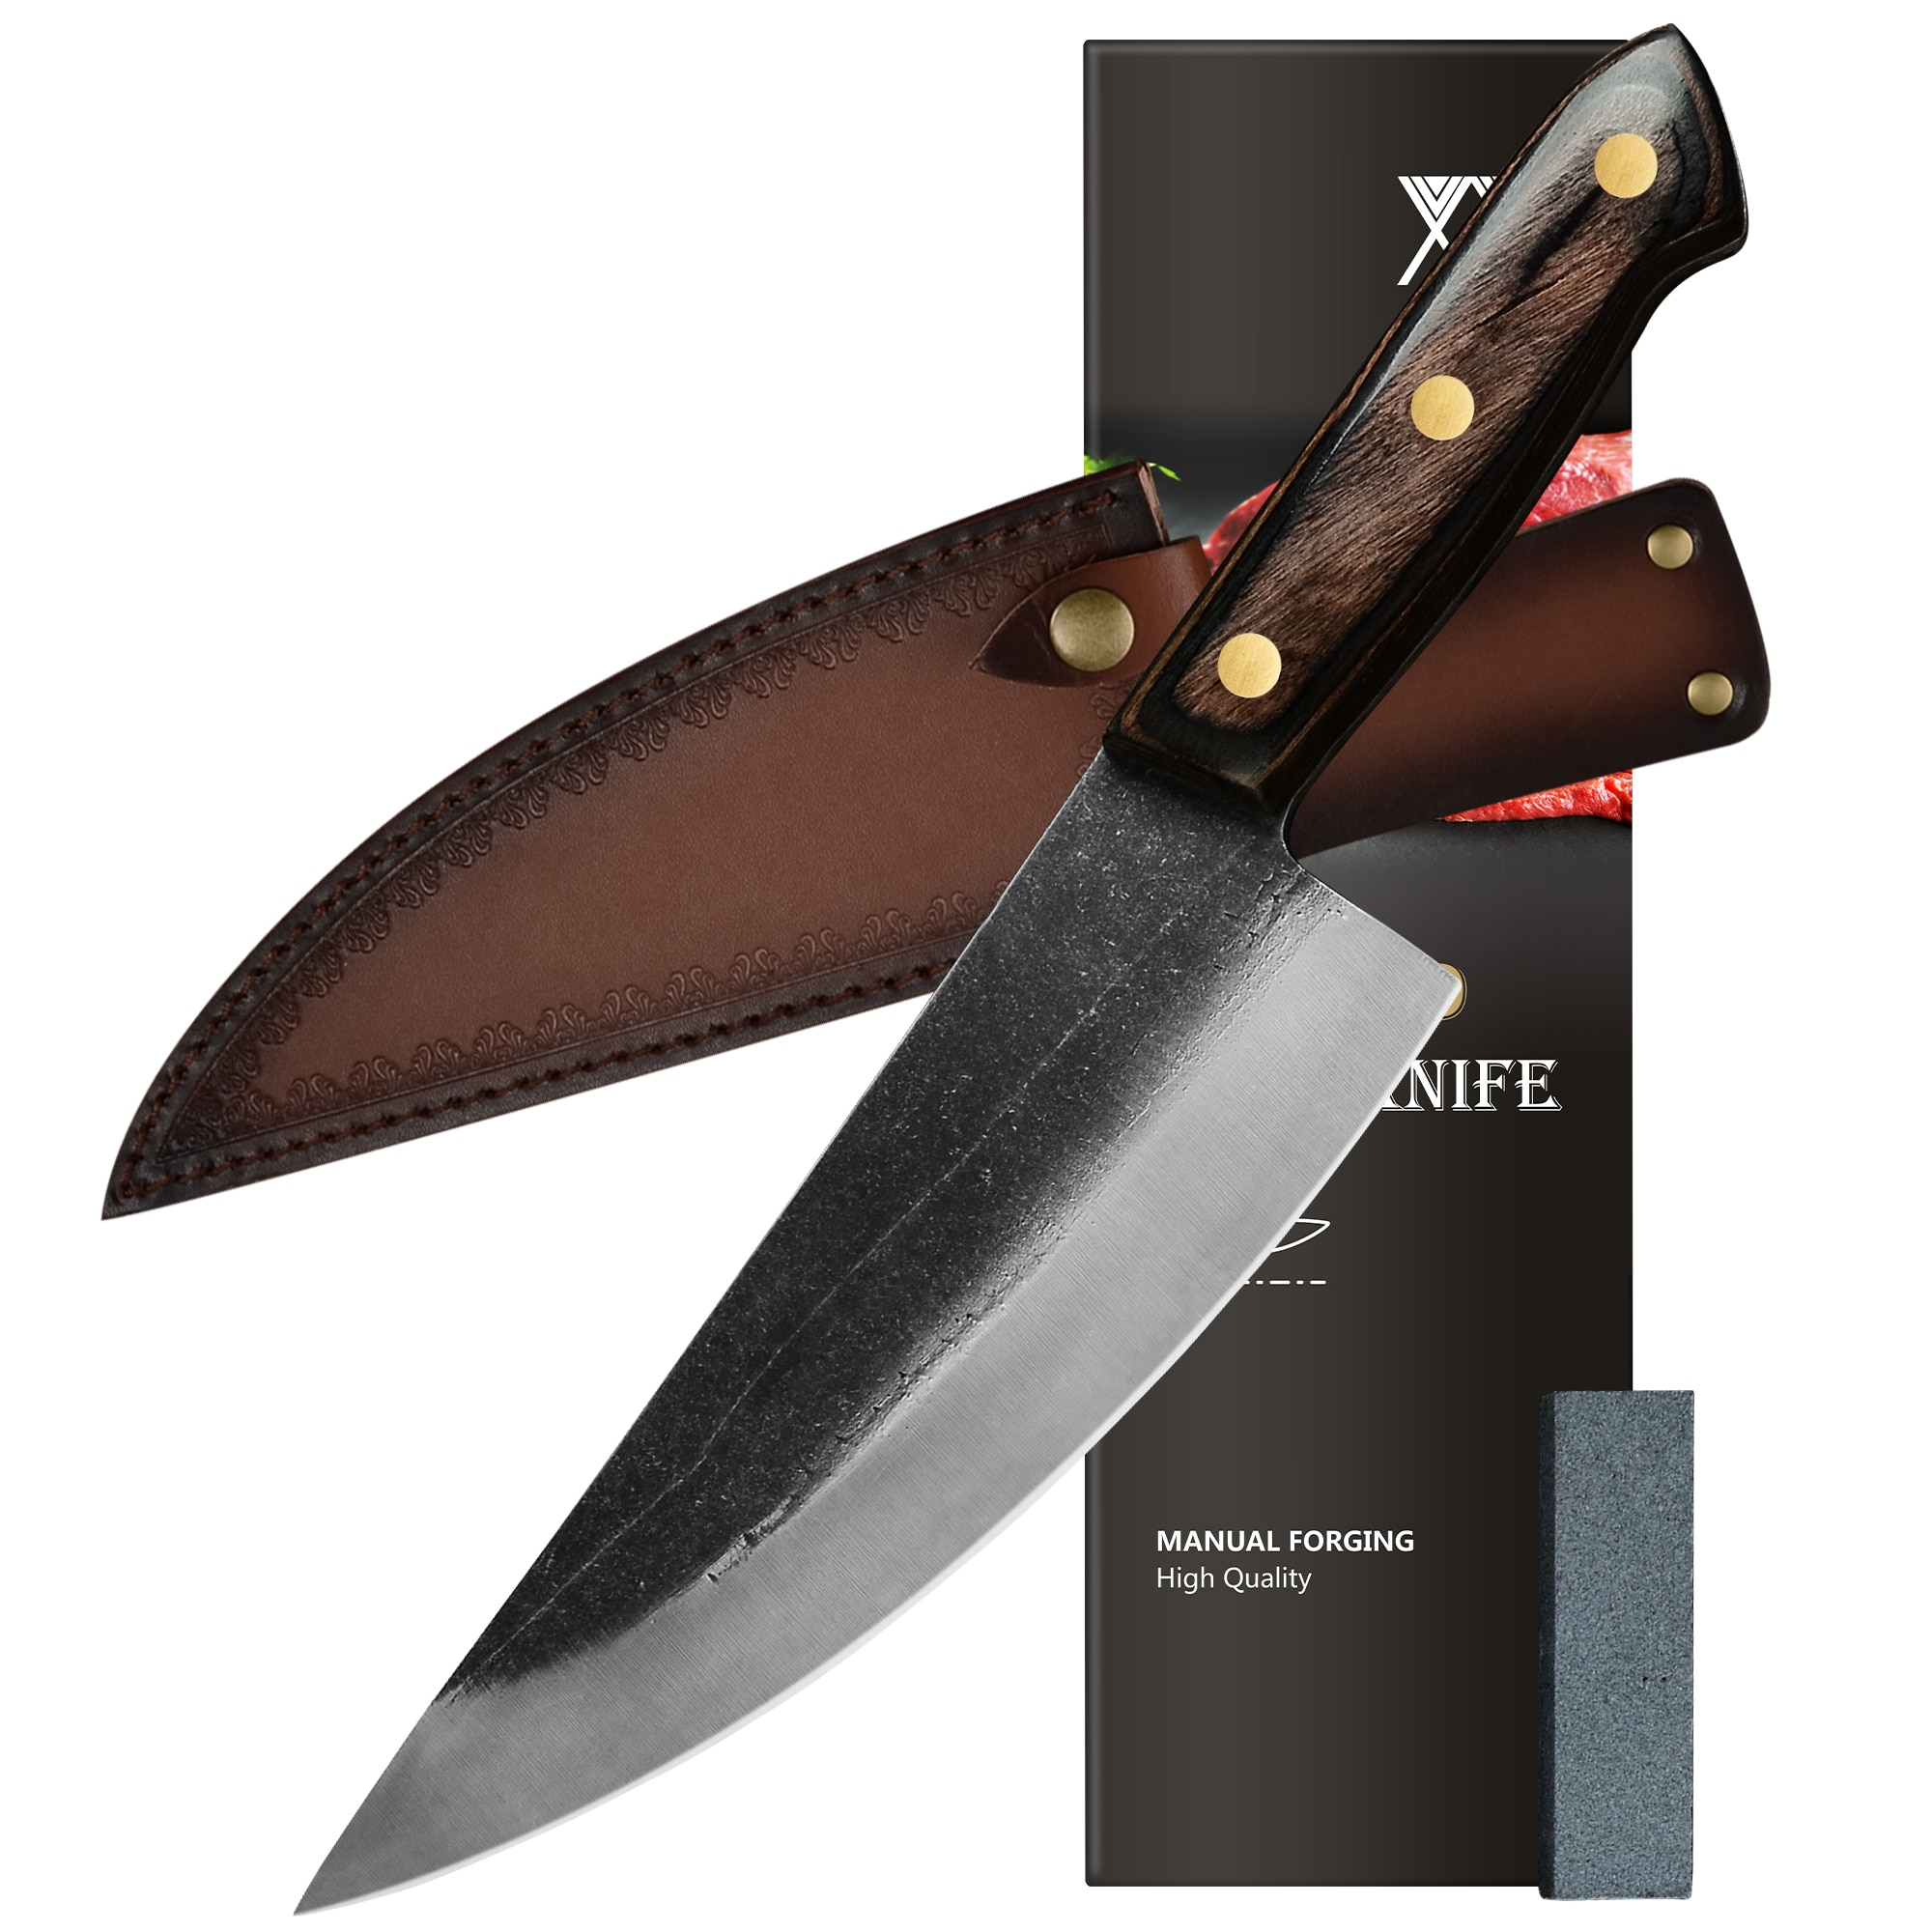 XYJ كامل تانغ 8 بوصة سكين الطاهي برو سكاكين المطبخ عالية الكربون الفولاذ المقاوم للصدأ تقطيع اللحوم الساطور السكاكين الخضار مع غمد